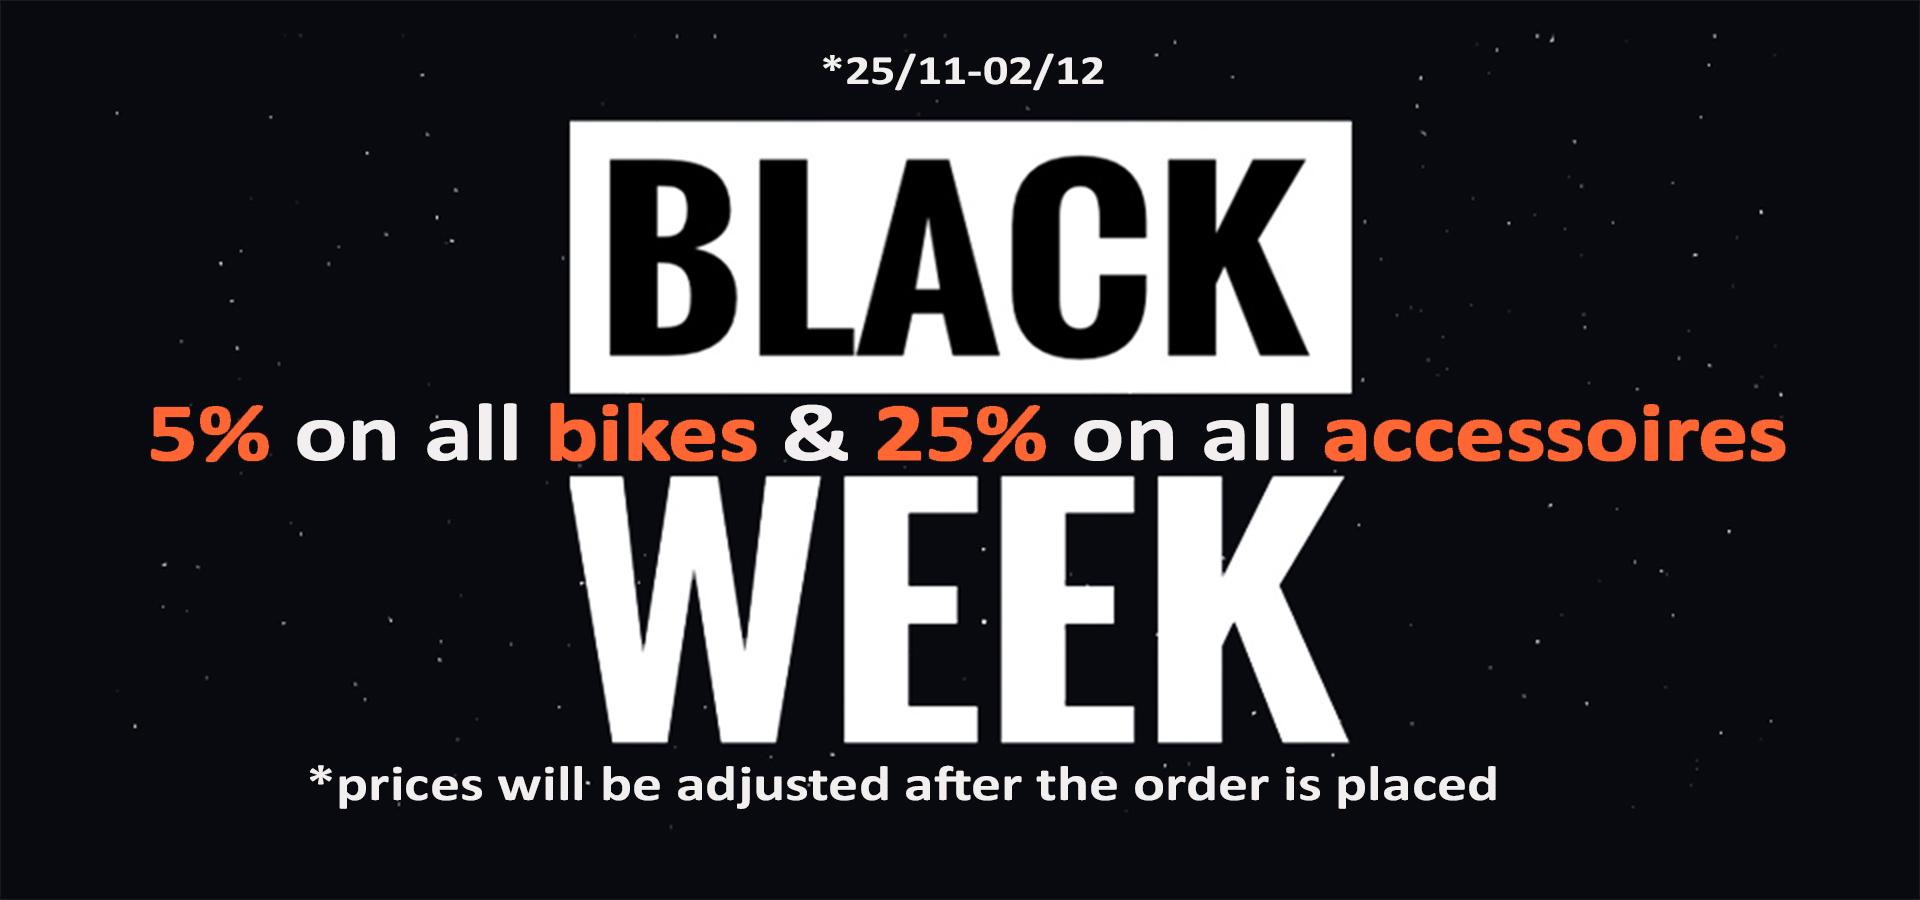 Black Week Promo Black Friday 2019 eng